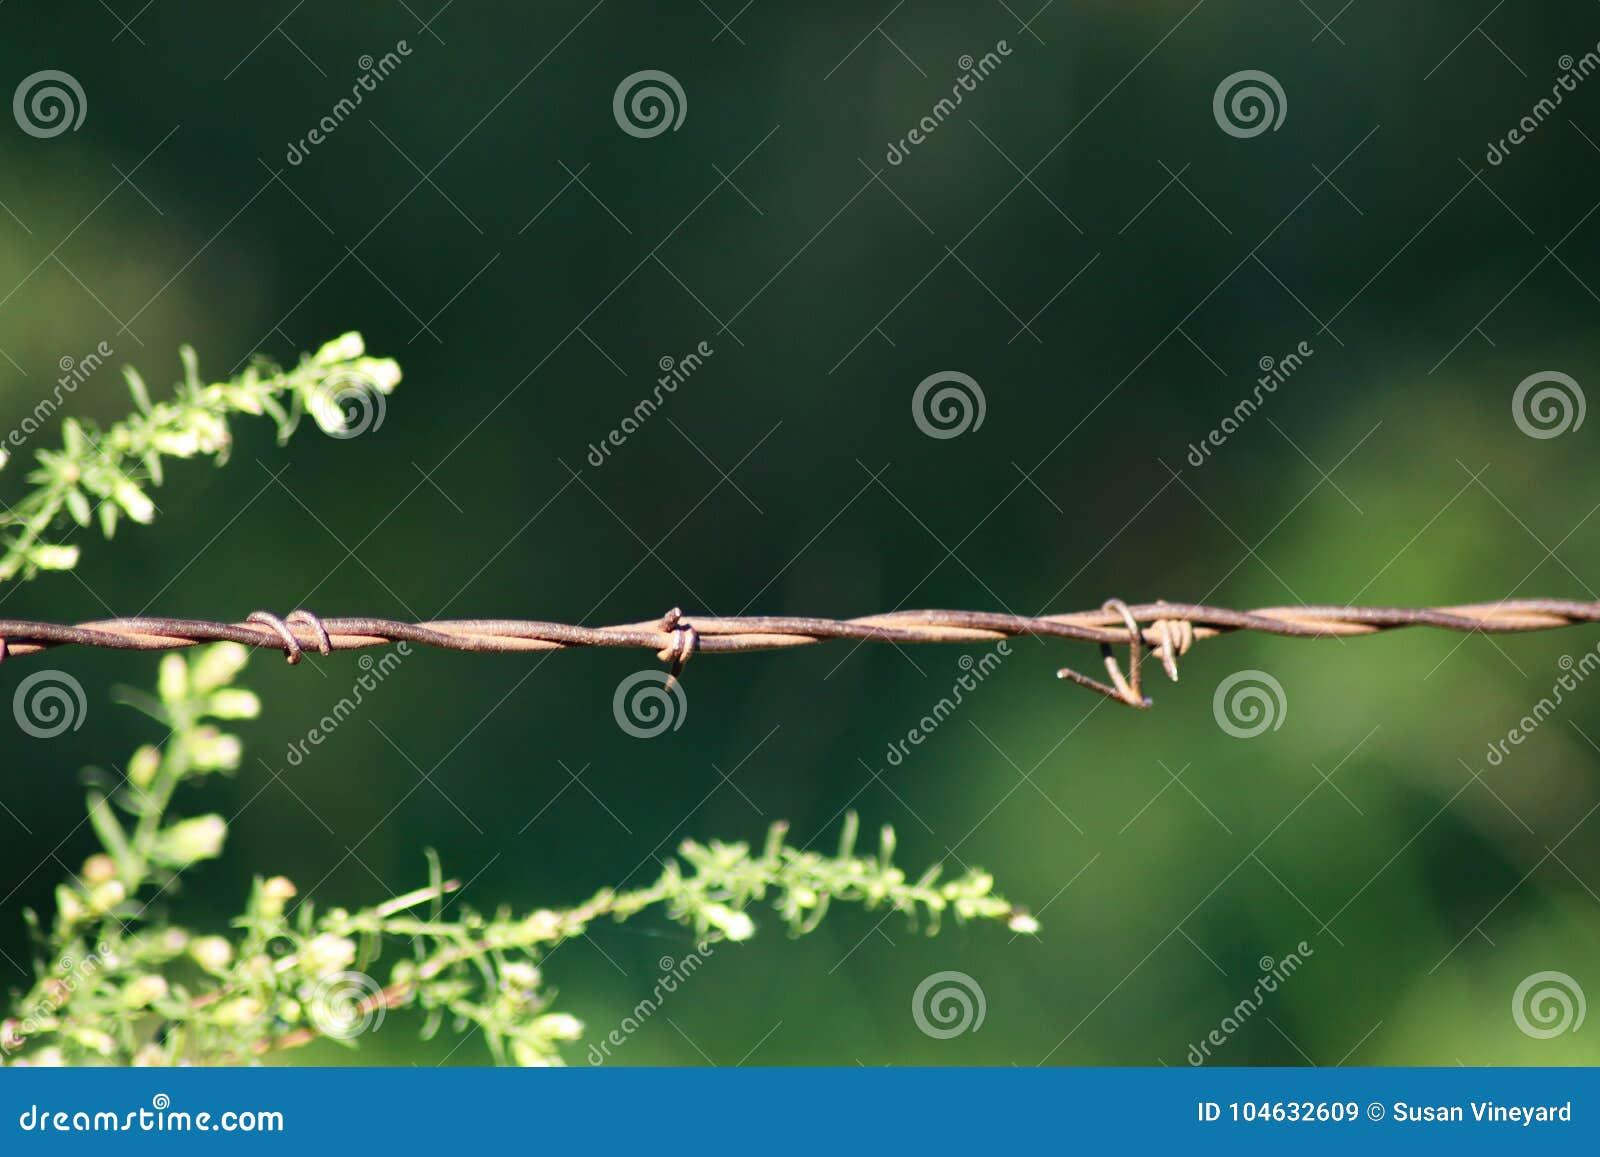 Download Prikkeldraadomheining Op Groene Achtergrond Stock Afbeelding - Afbeelding bestaande uit land, gevangenis: 104632609